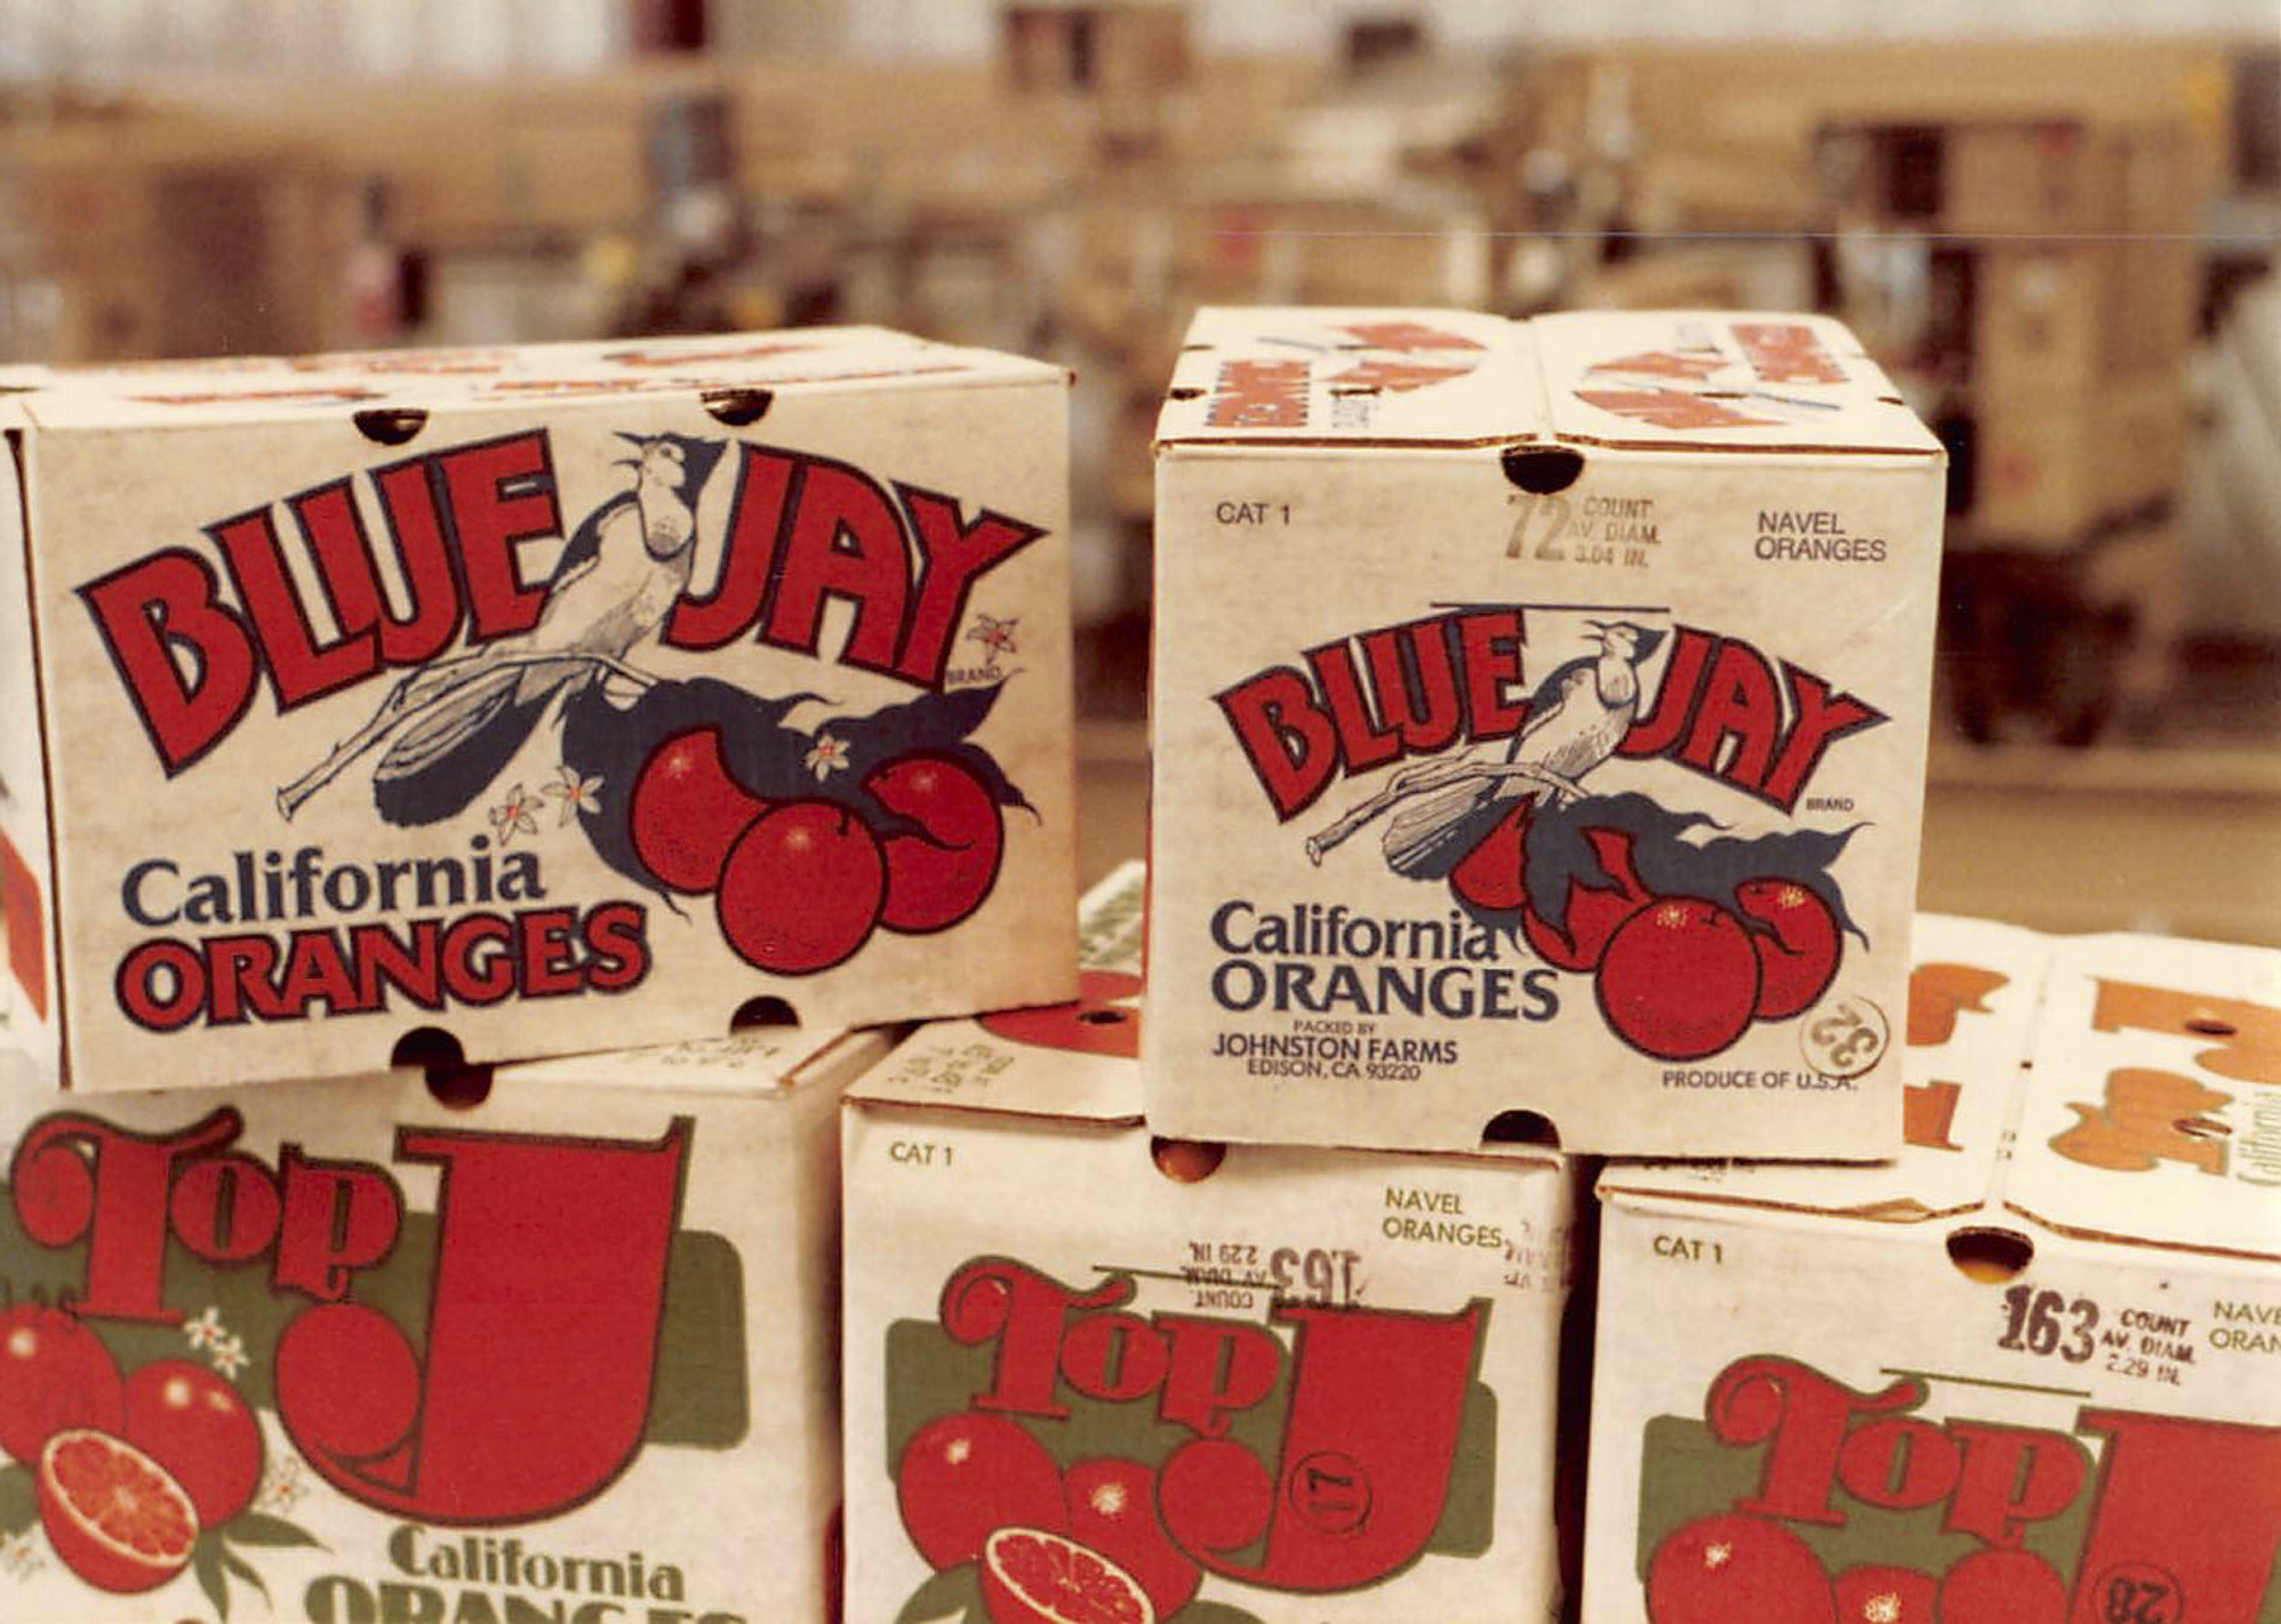 Bluejay Cartons